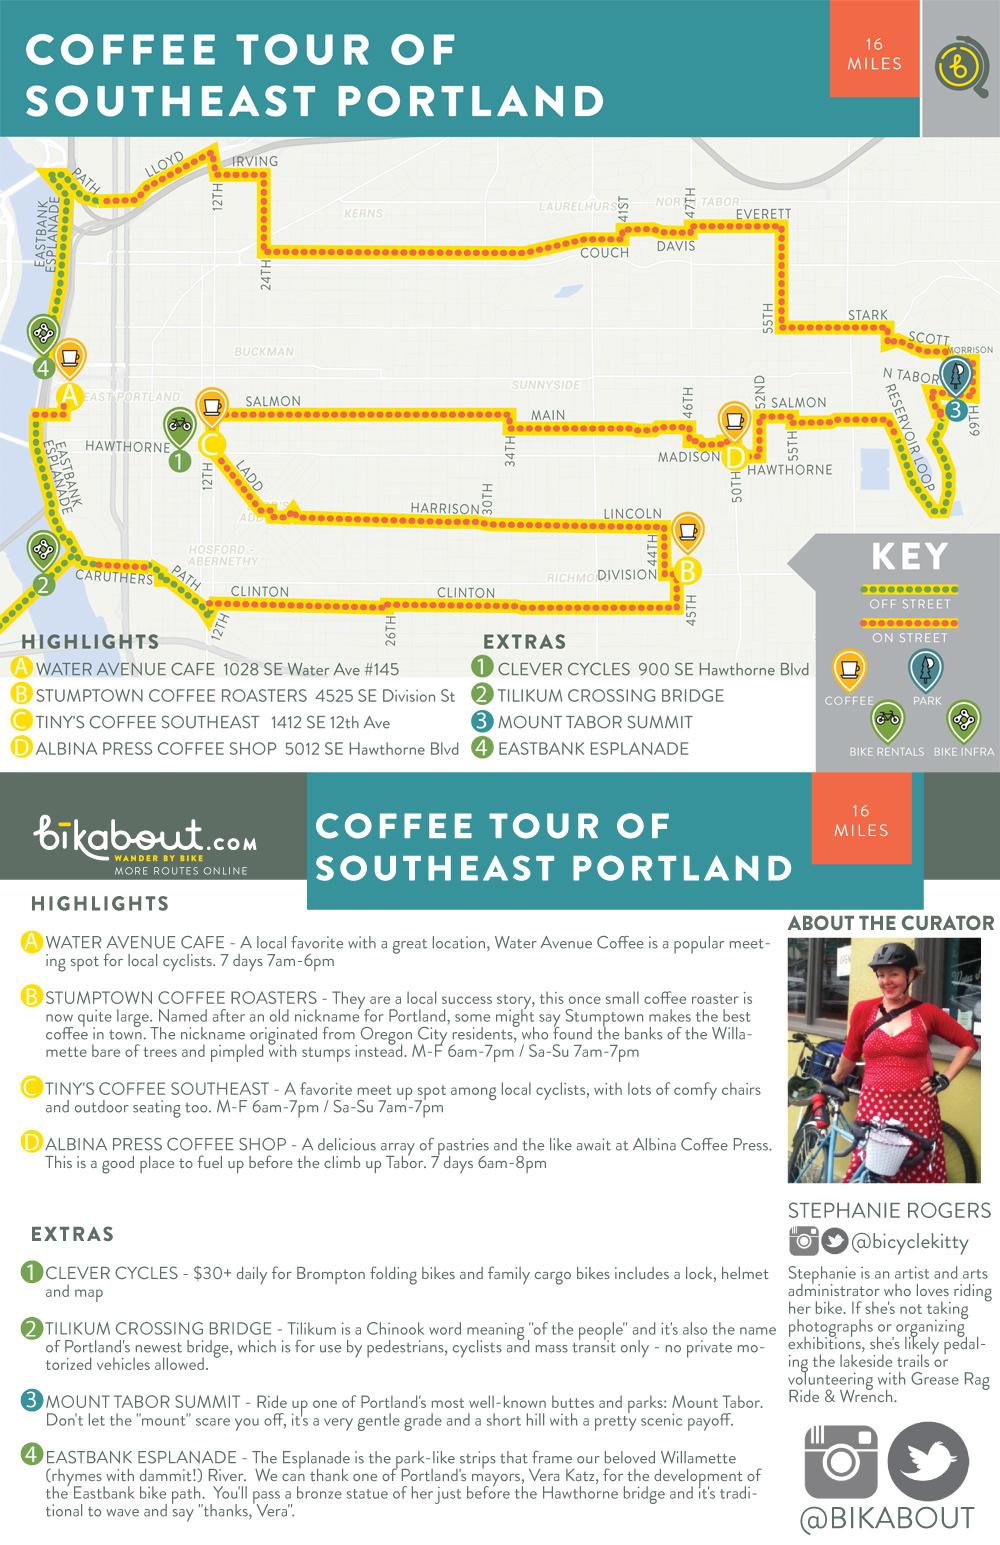 Bikabout-Bike-Map-Coffee-Tour-of-Southeast-Portland.jpg